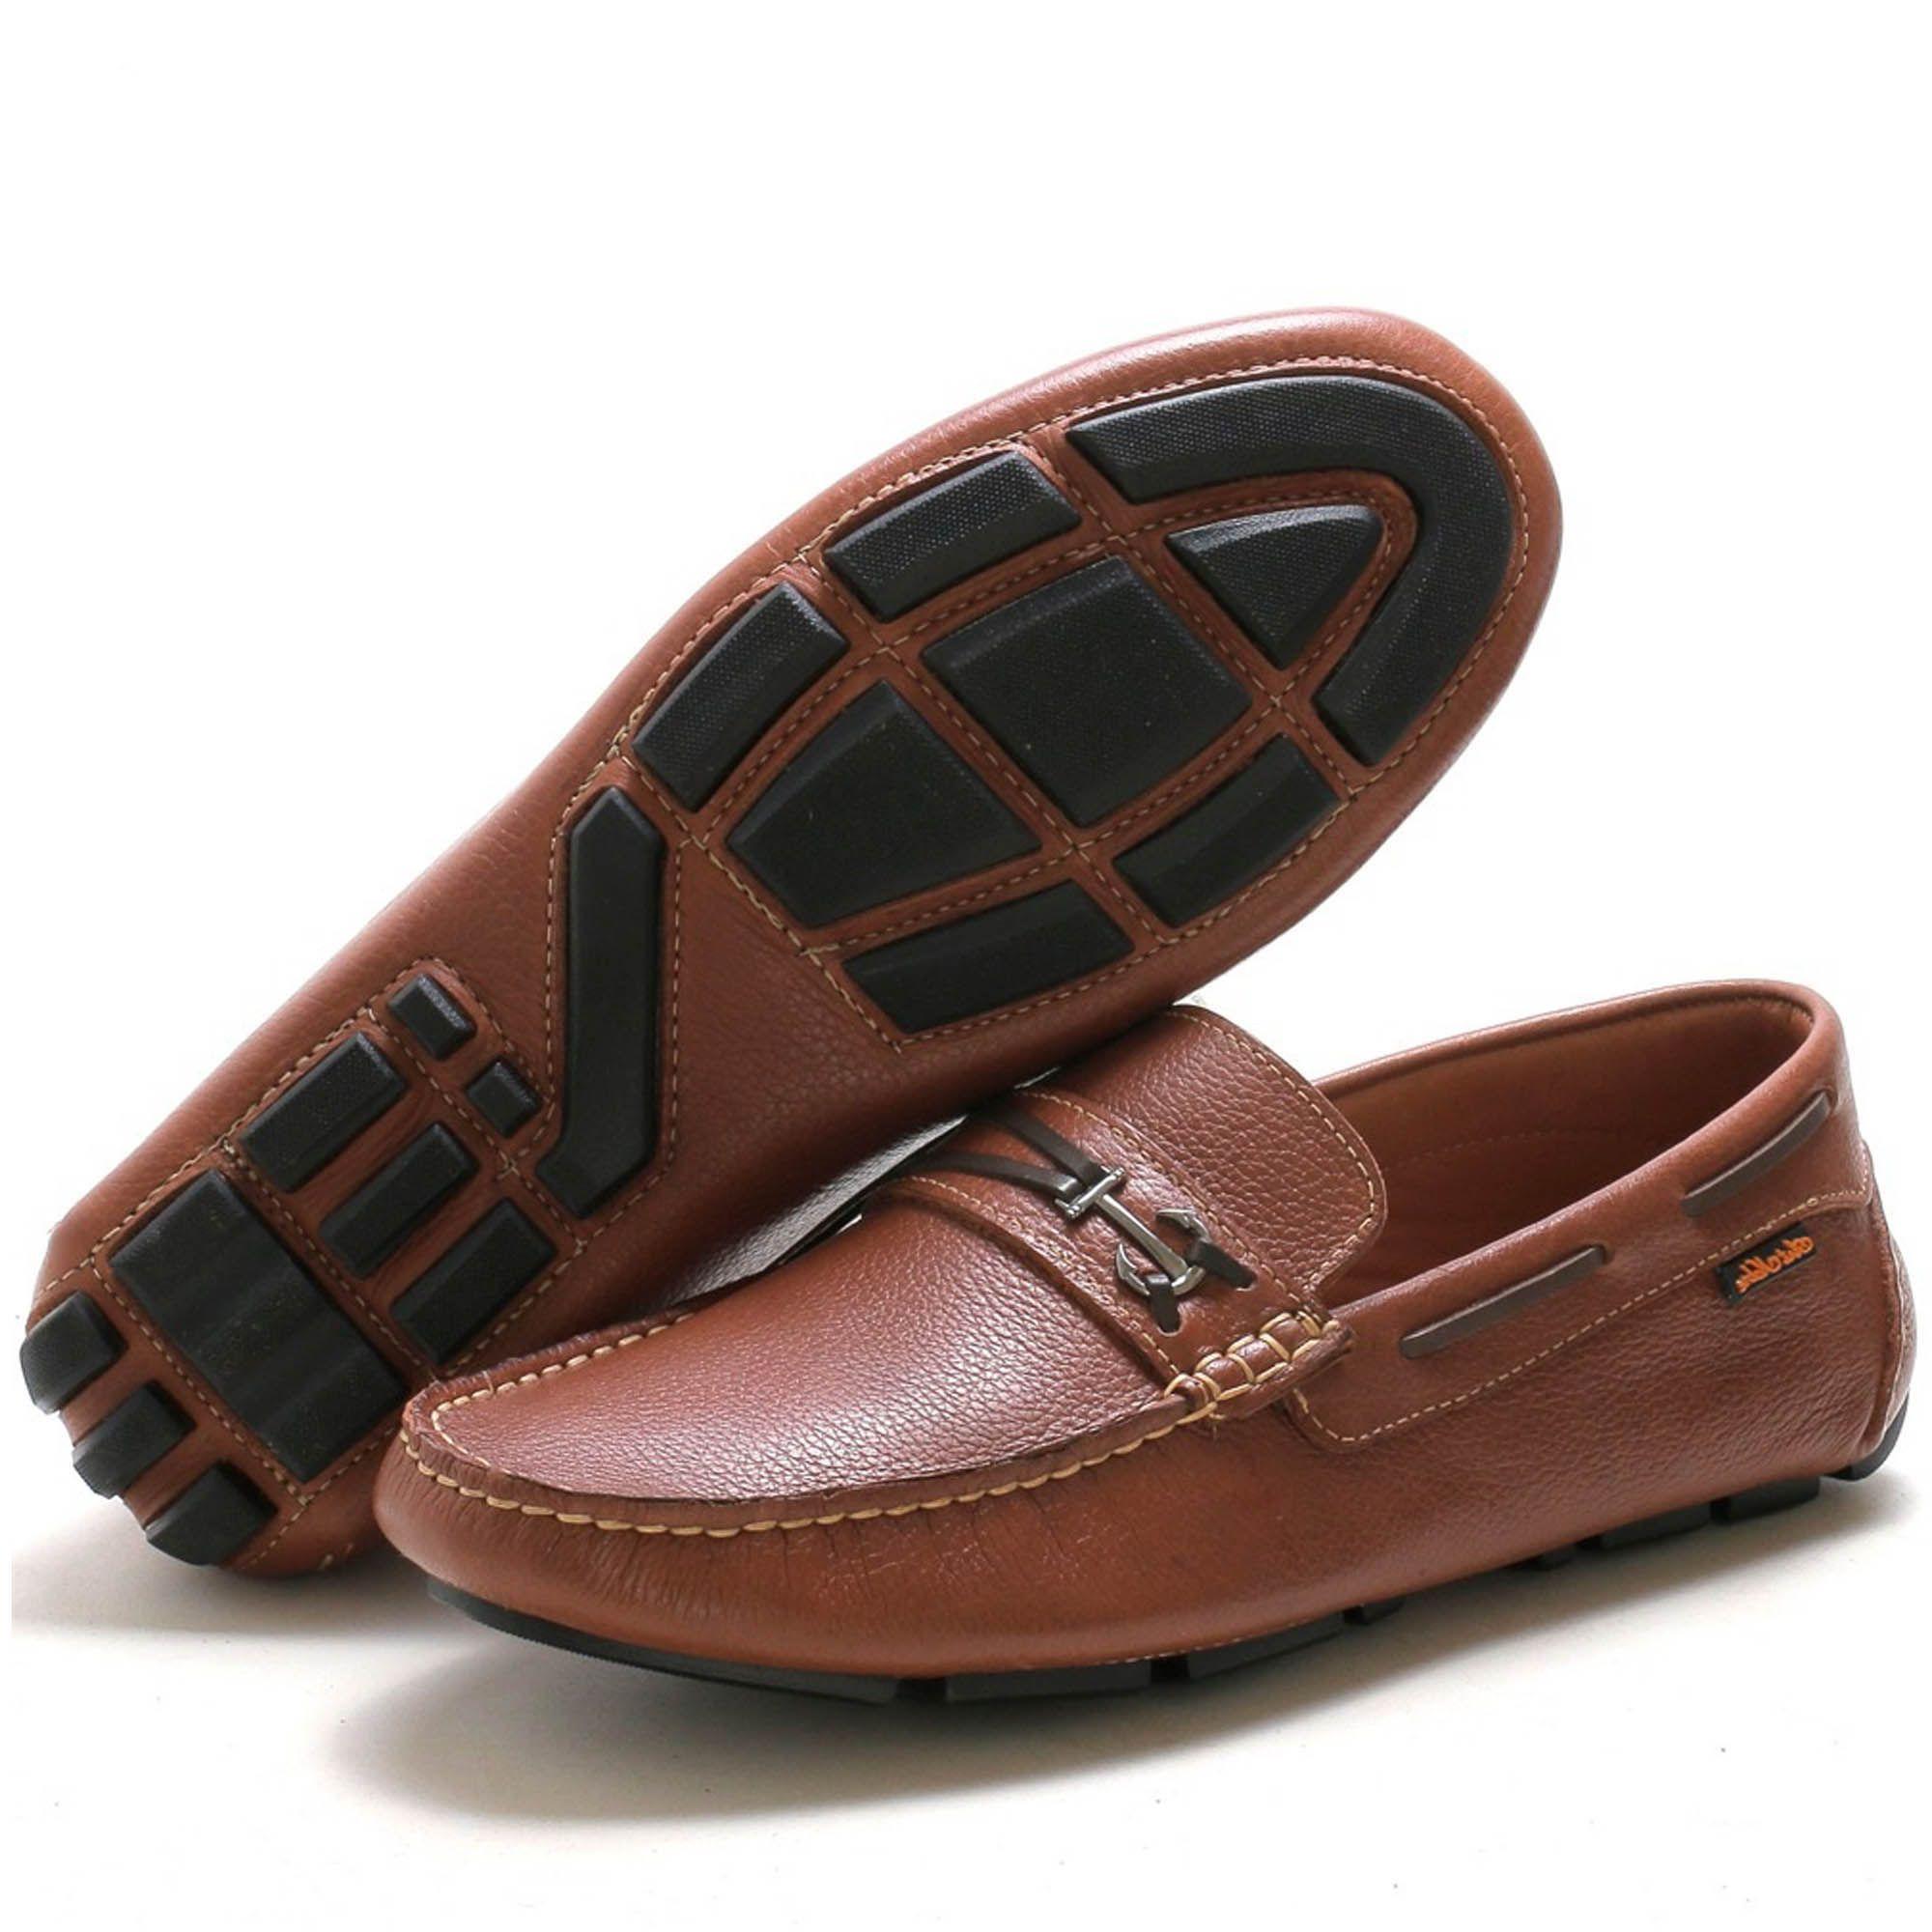 Sapato Mocassim dockside masculino em couro na cor havana 3460